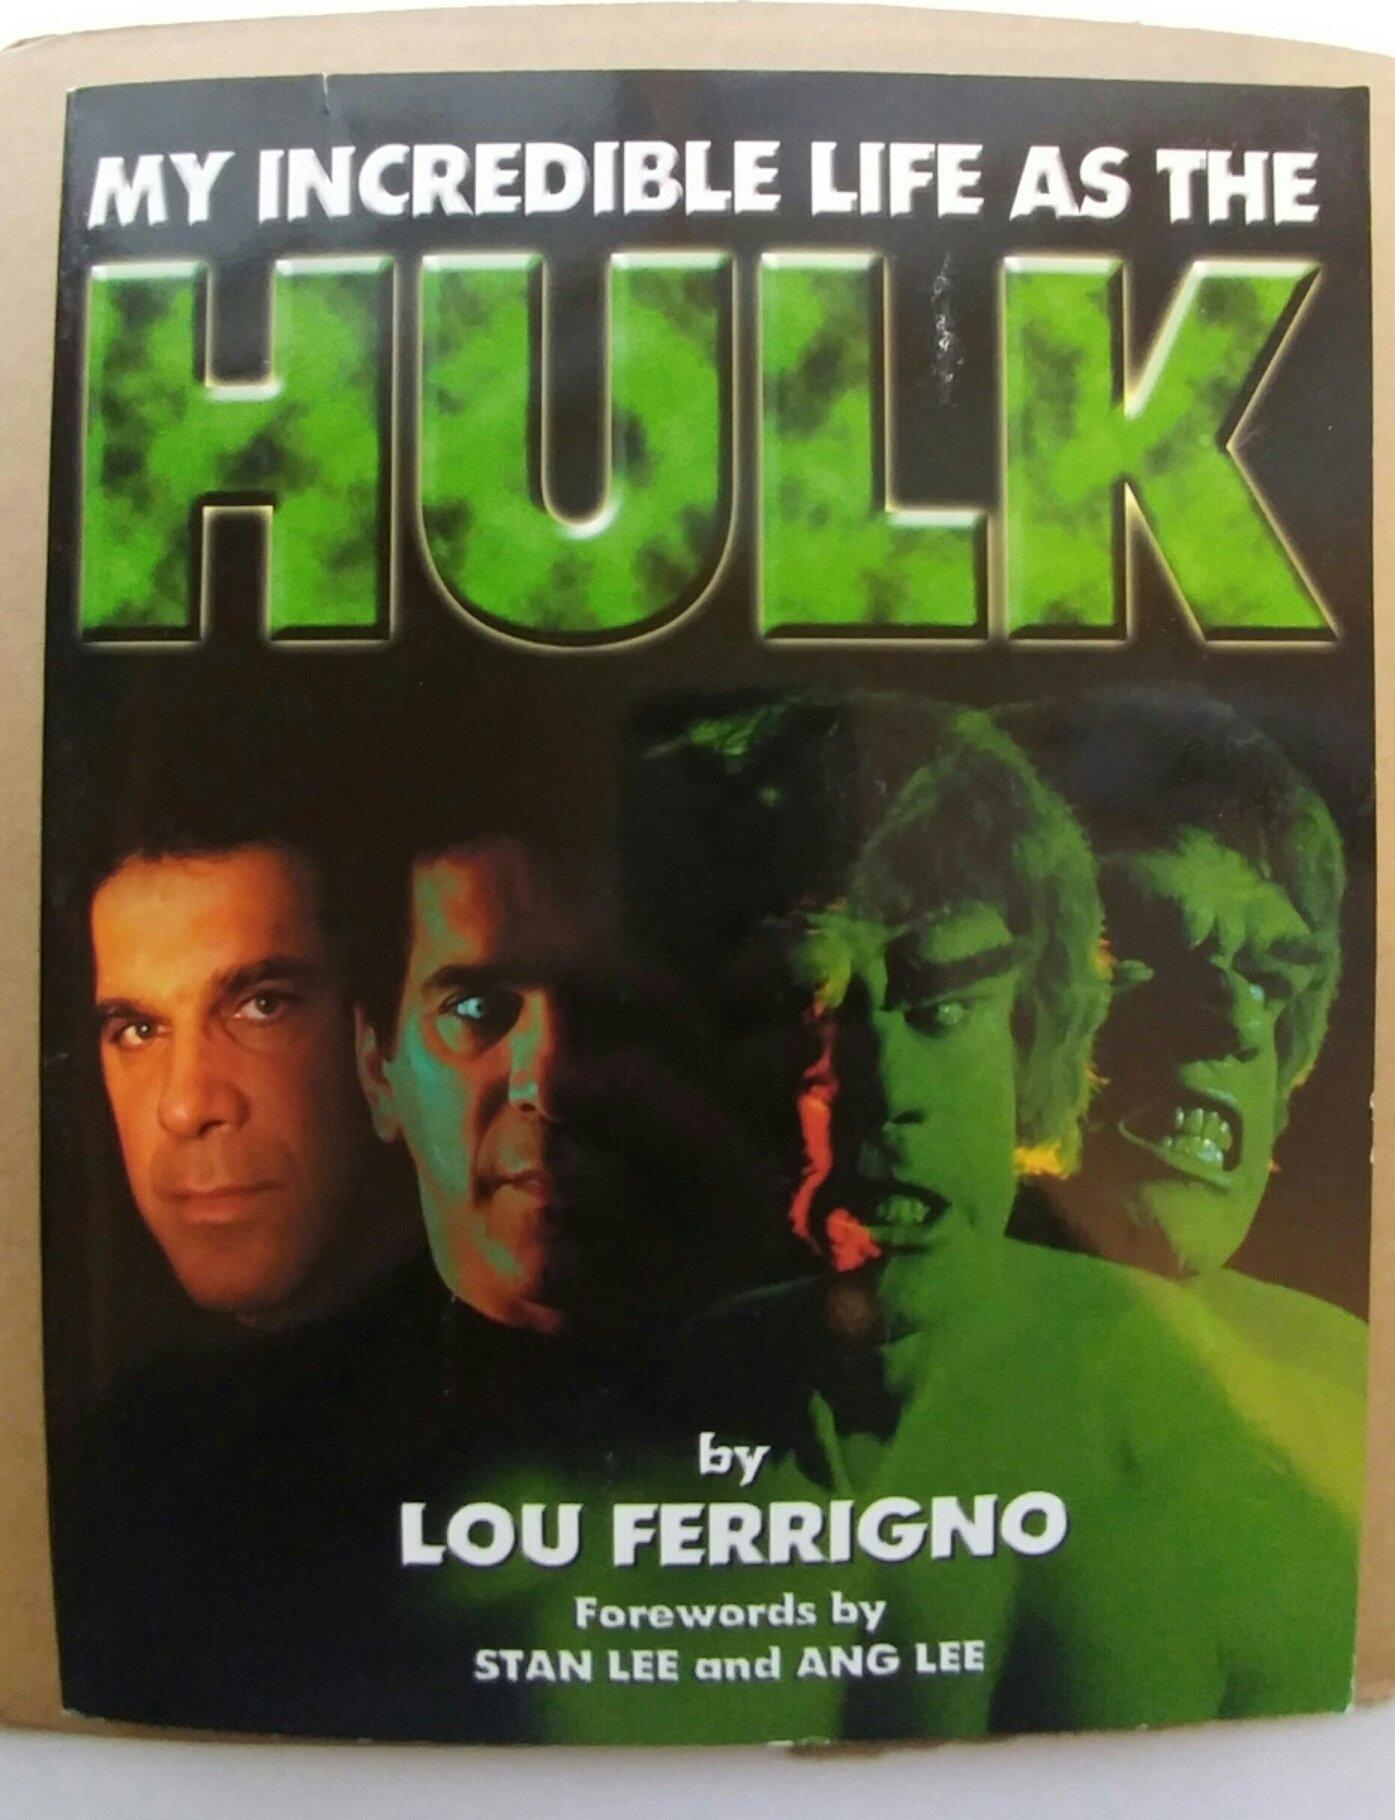 My Incredible Life As the Hulk: Lou Ferrigno: 9780964373907 ...